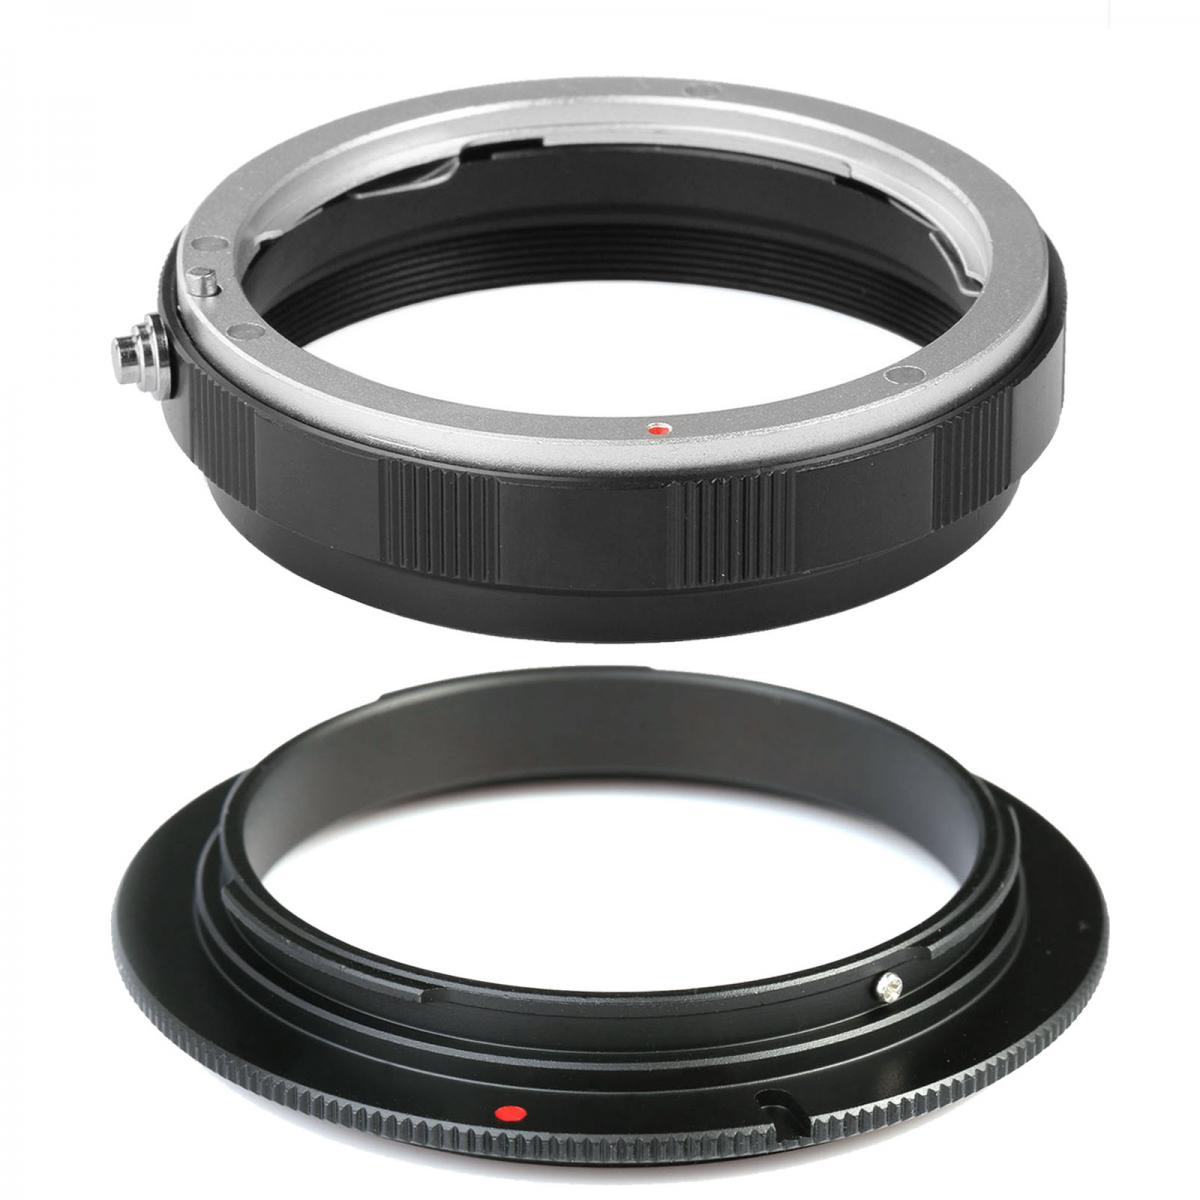 K Amp F Concept 58mm Macro Reverse Adapter Ring Lens Mount